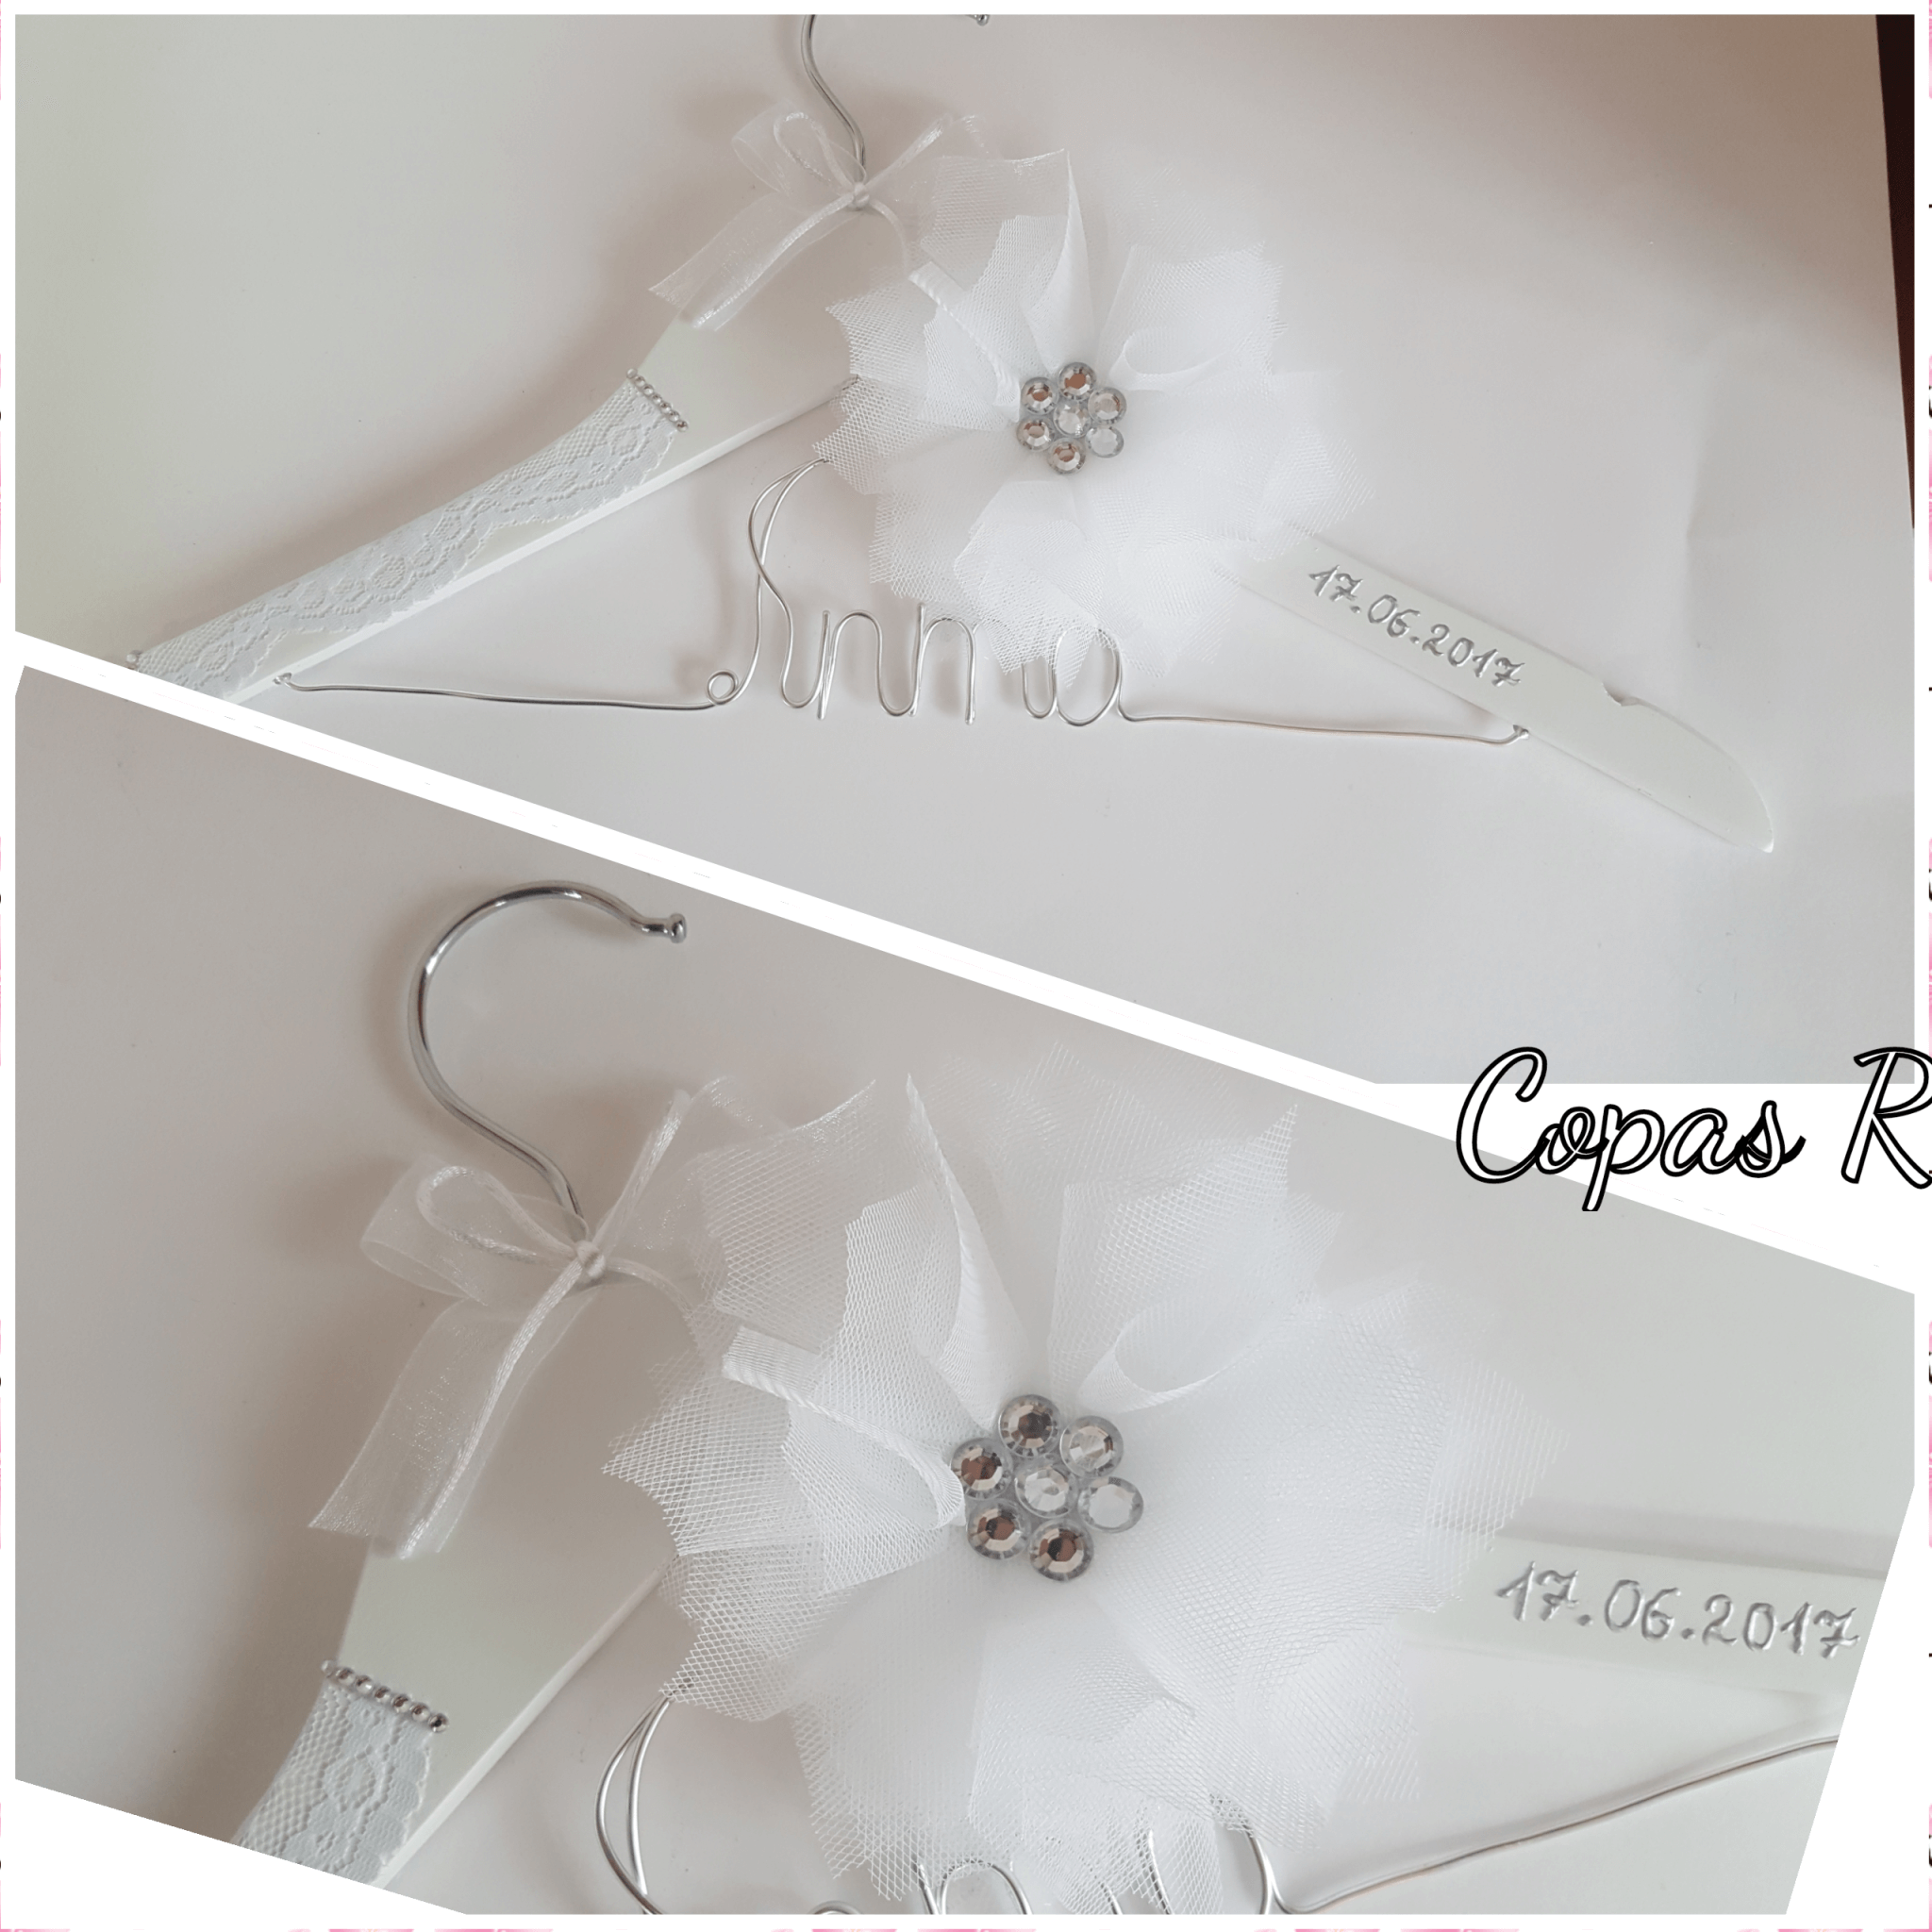 perchas personalizadas perchas personalizadas - perchas personalizadas 11 - Perchas personalizadas | perchas novios | perchas personalizadas boda